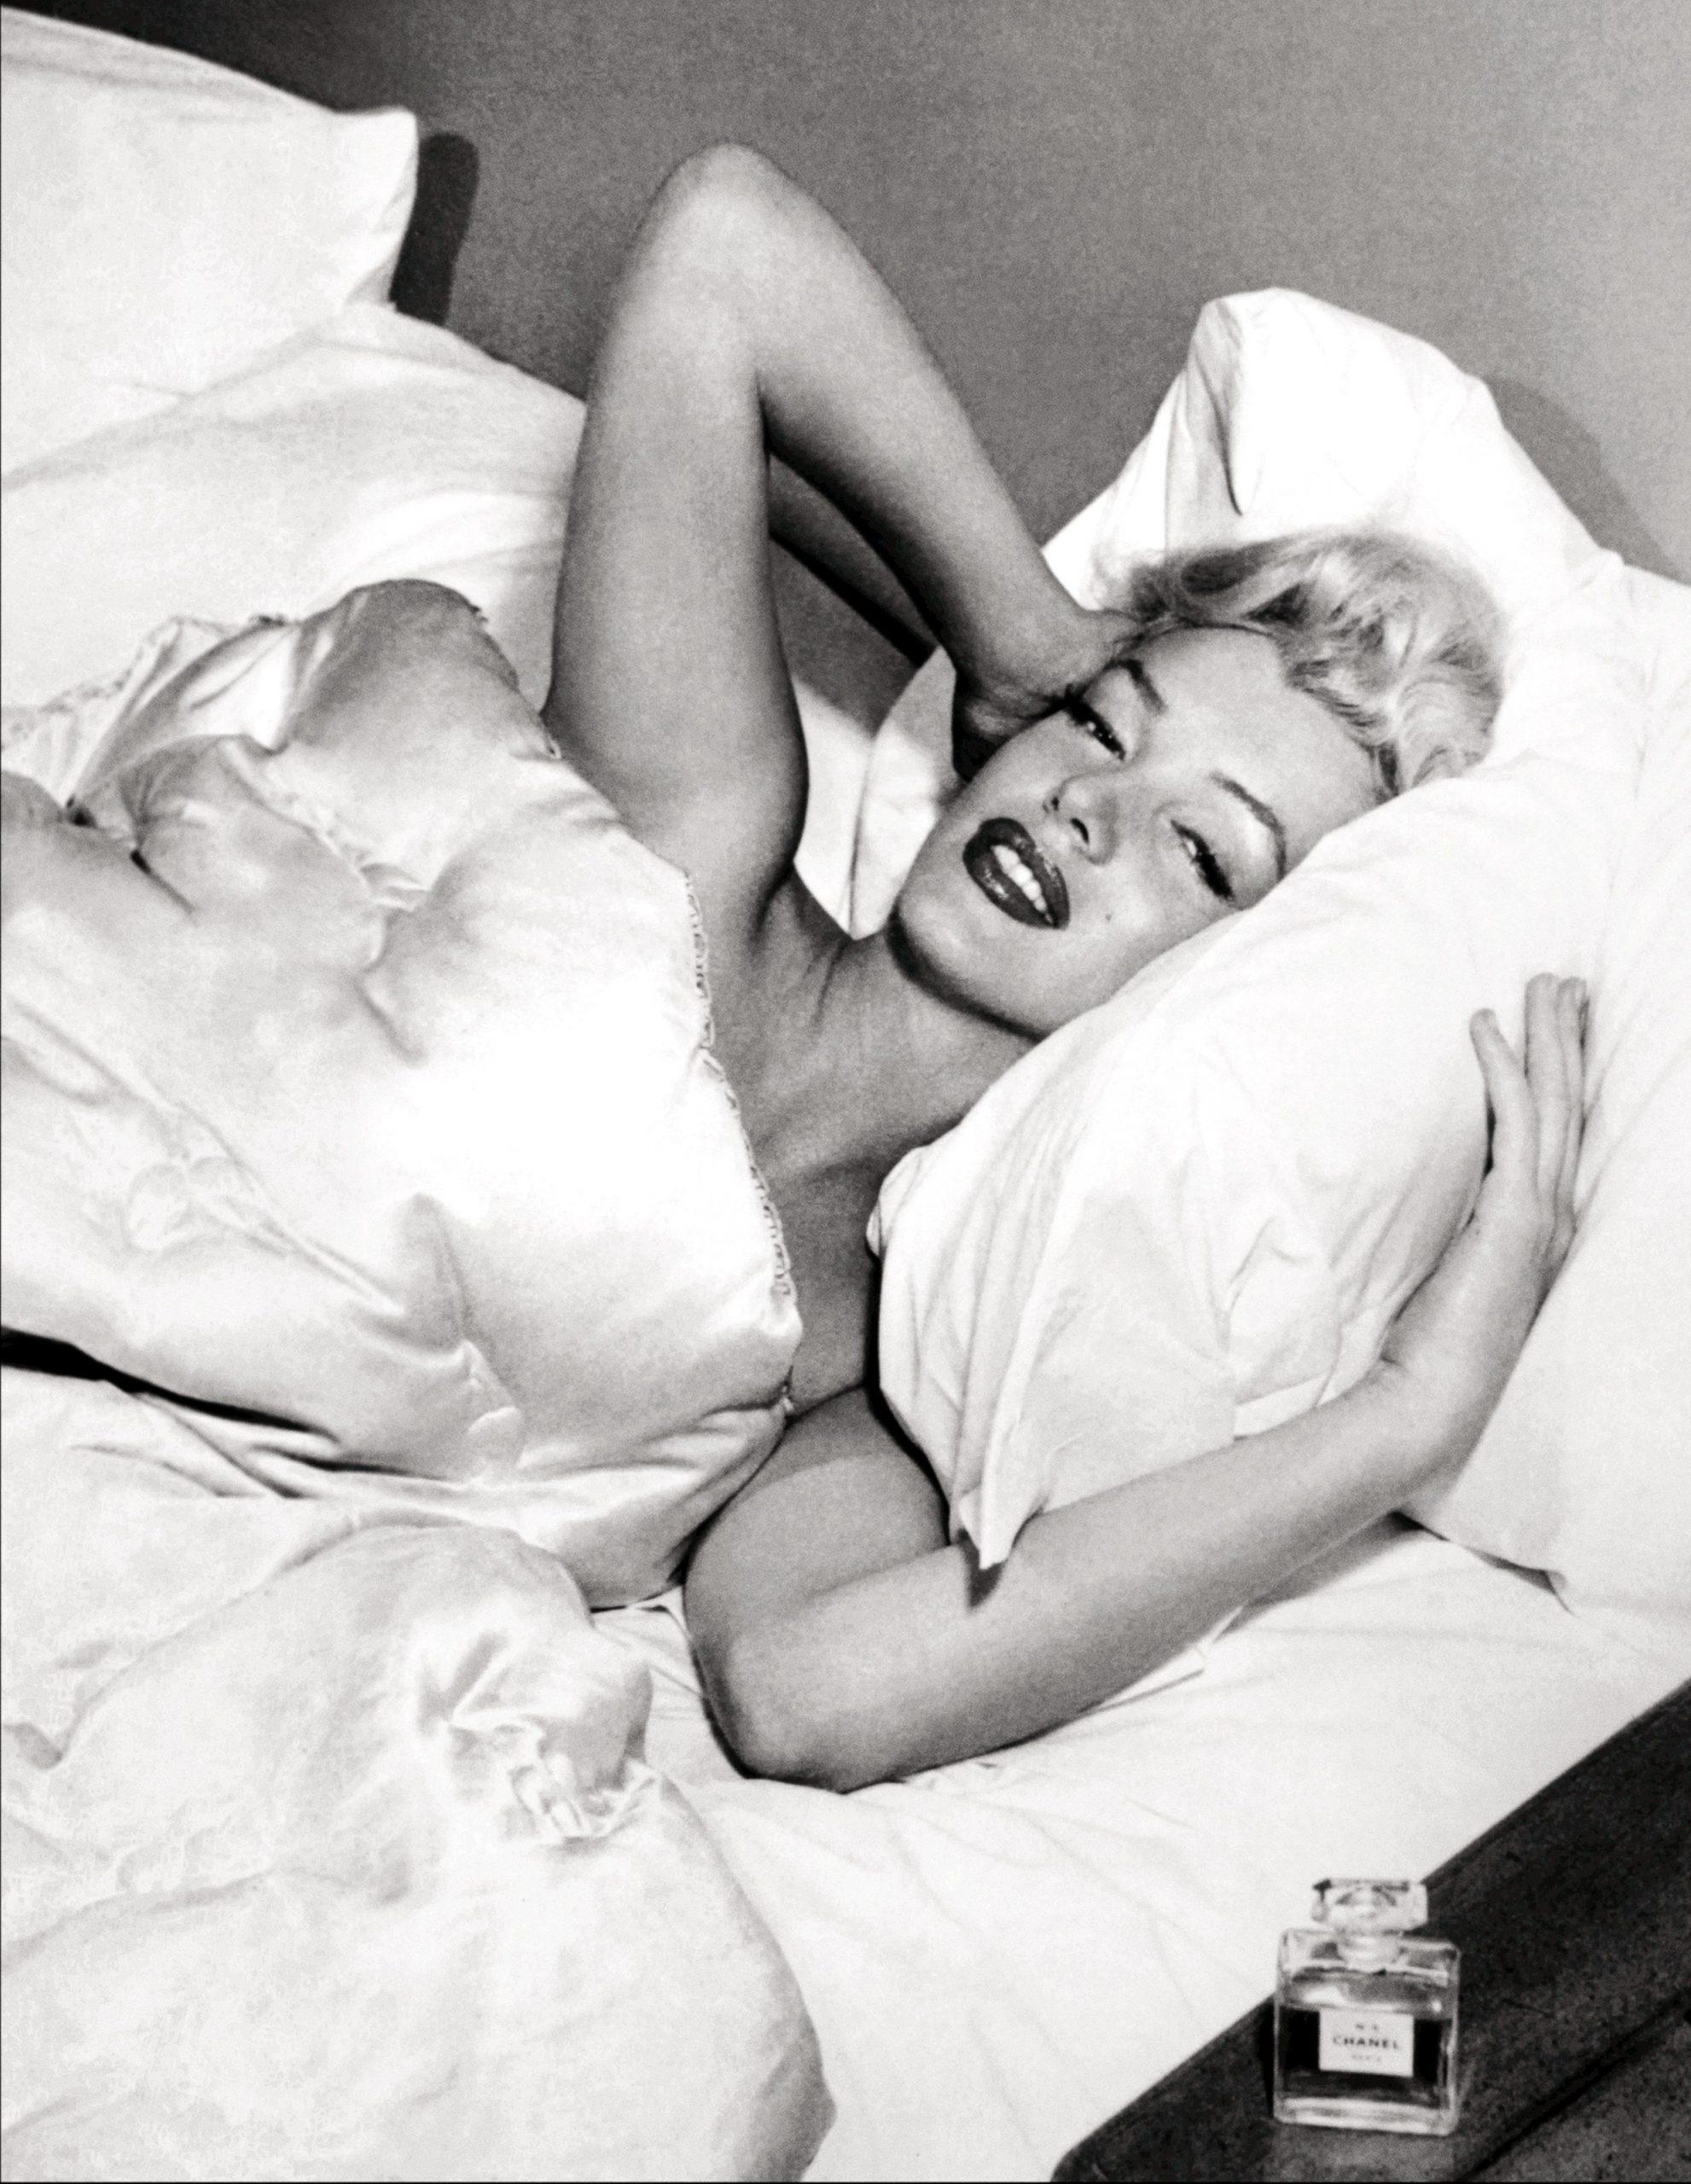 Chanel-Marilyn-Monroe-100-ans-parfums-N5